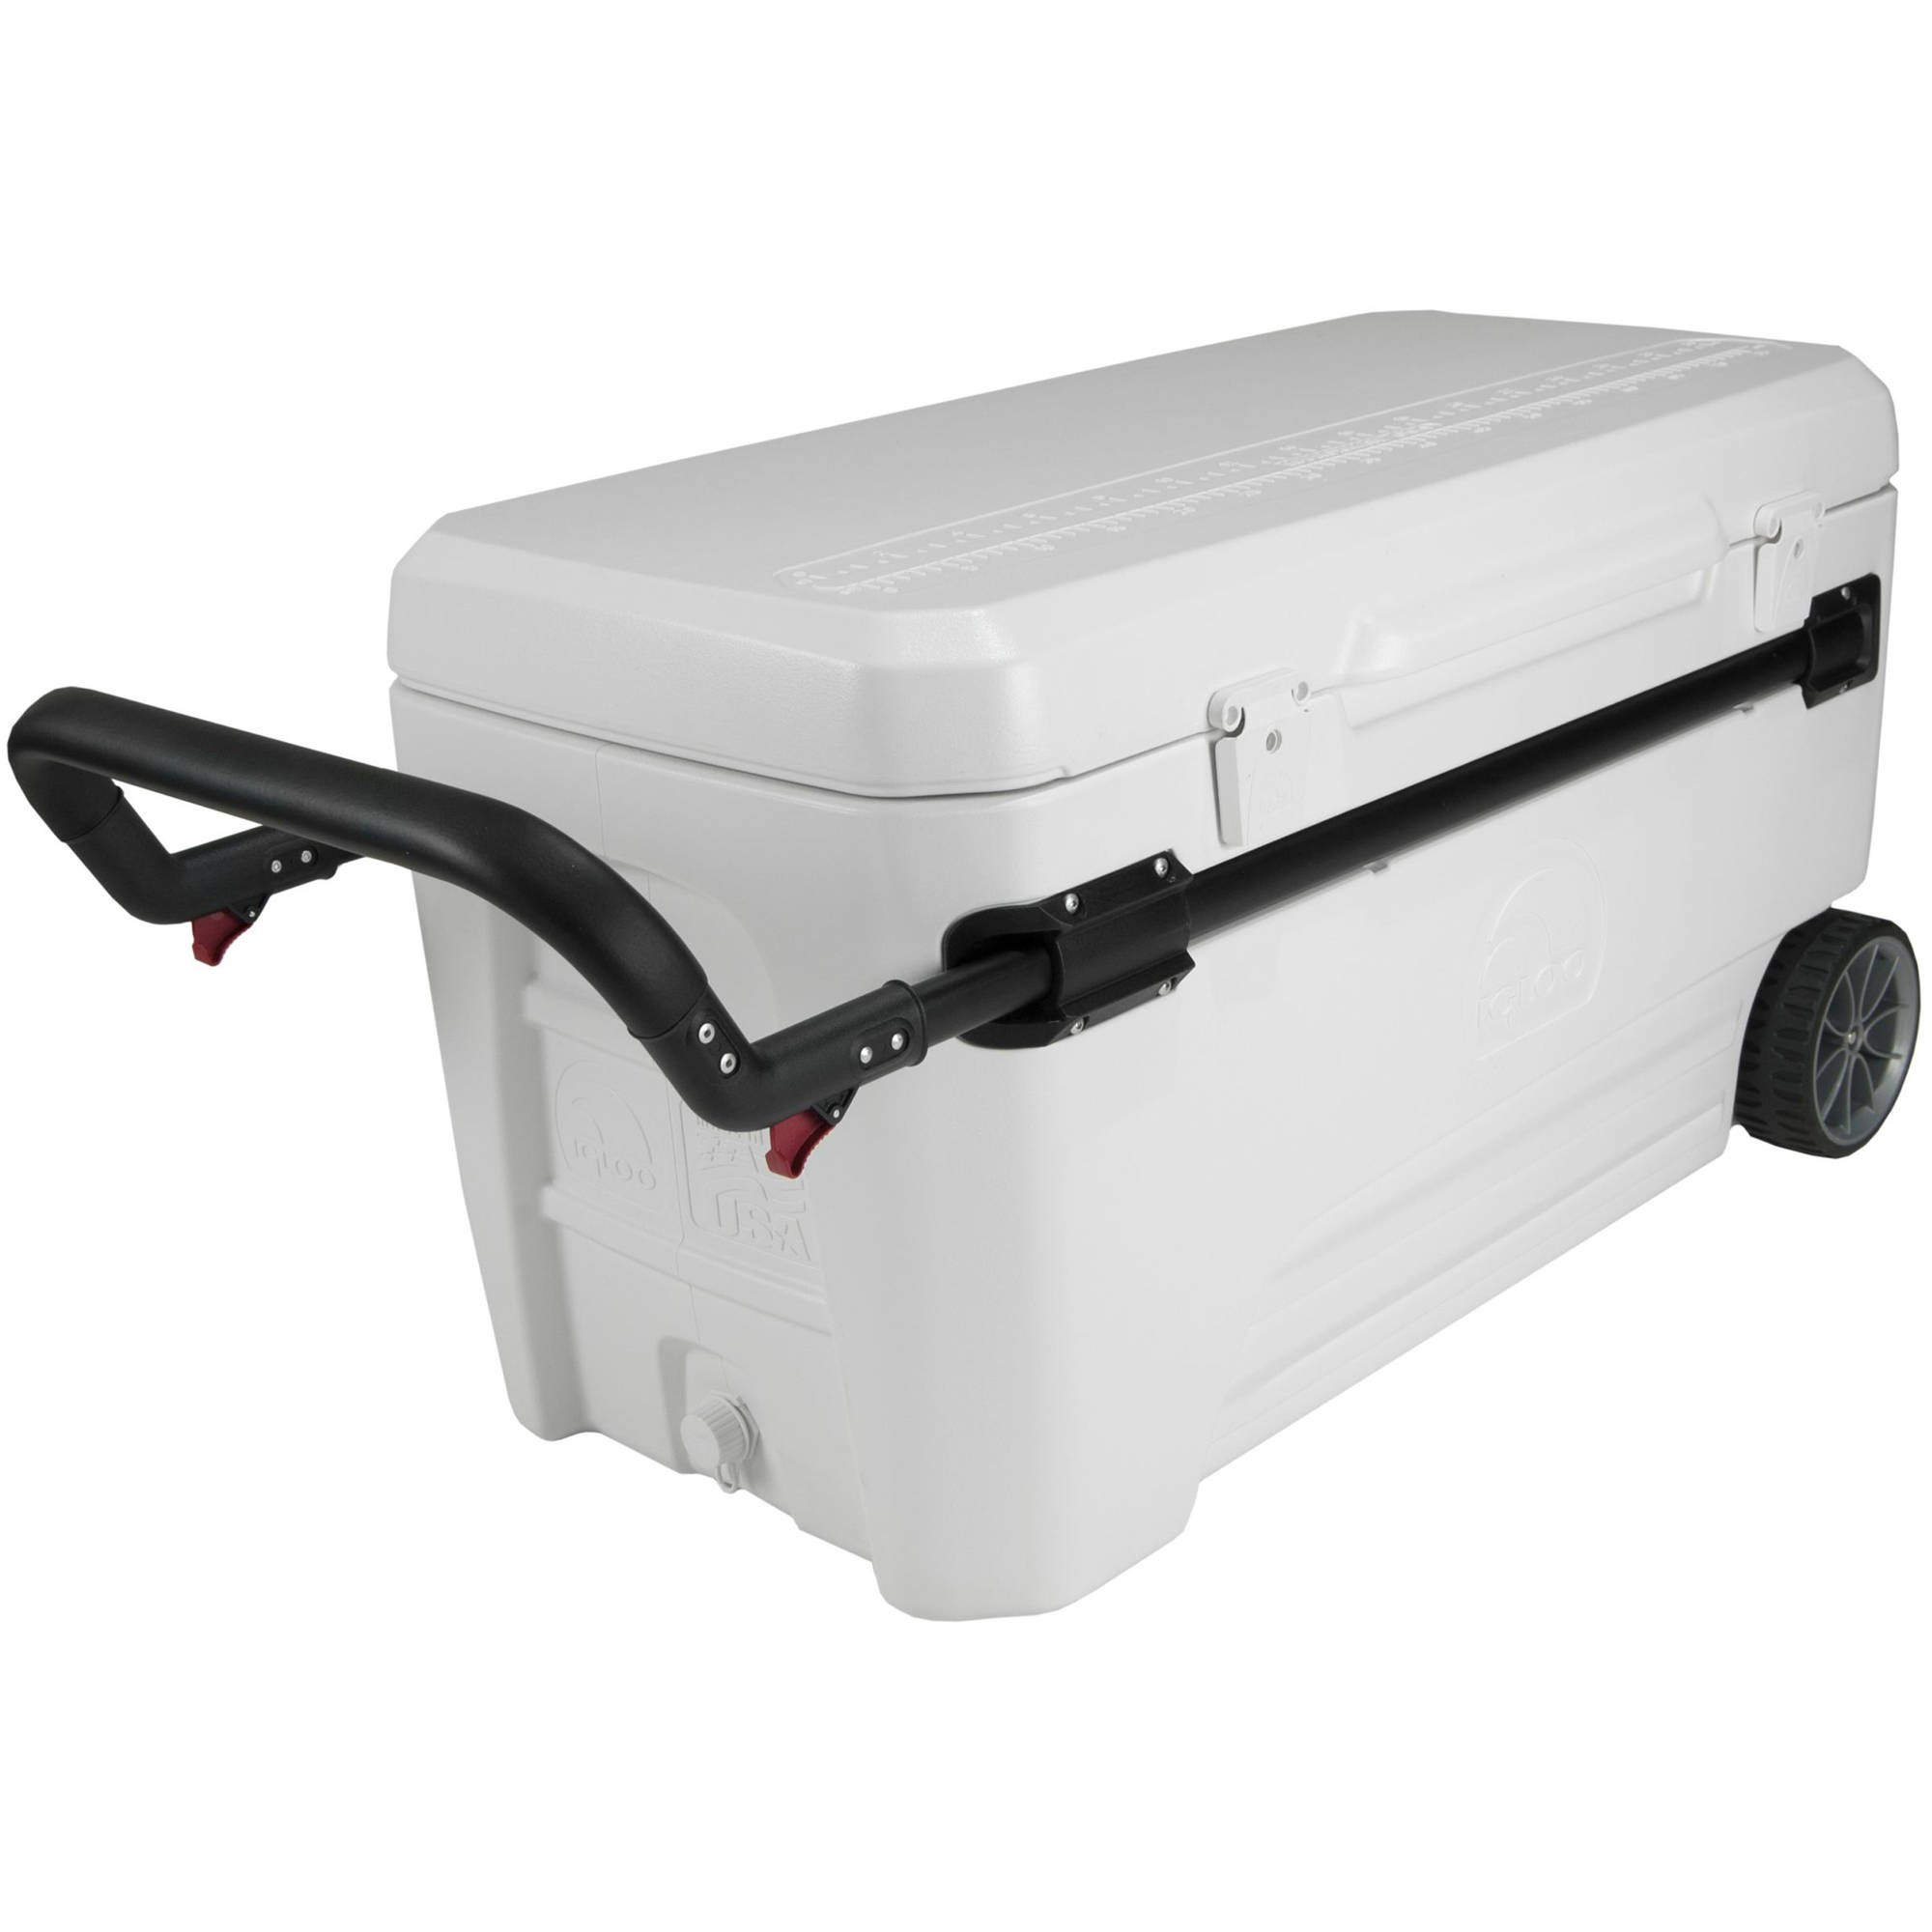 Igloo 45184 Glide Pro Cooler 110-Quart White